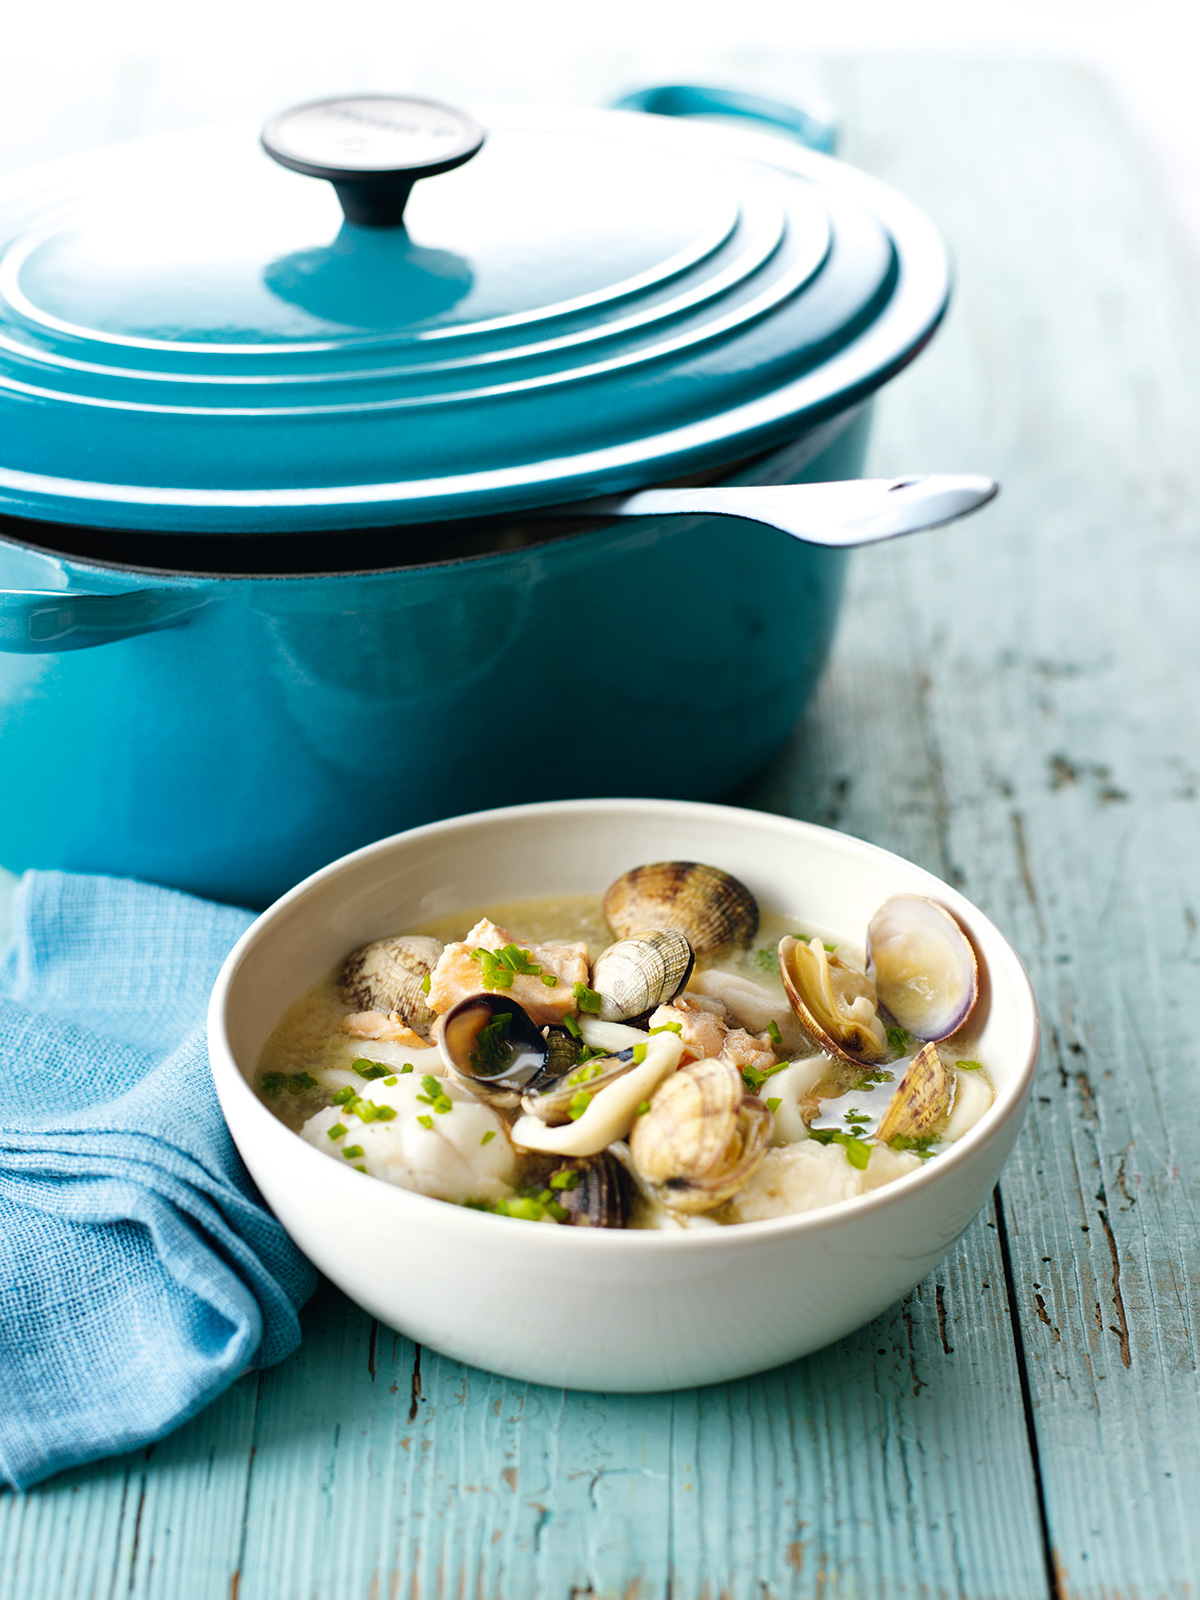 New recipe book teaches secrets of Seychelles' Creole seafood